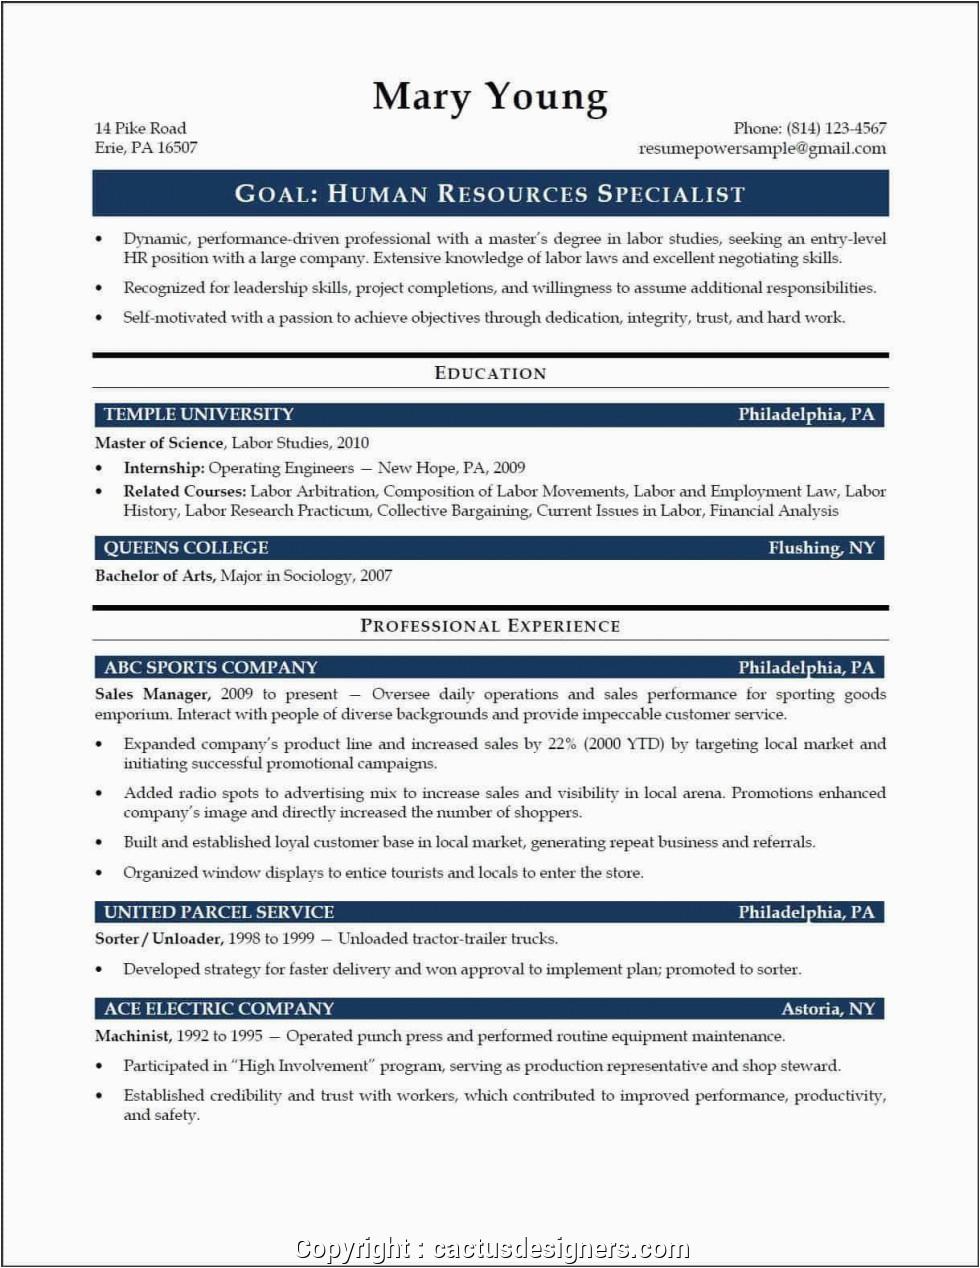 Sample Resume for Hr assistant Fresh Graduate Unique Sample Resume for Hr assistant Fresh Graduate Hr